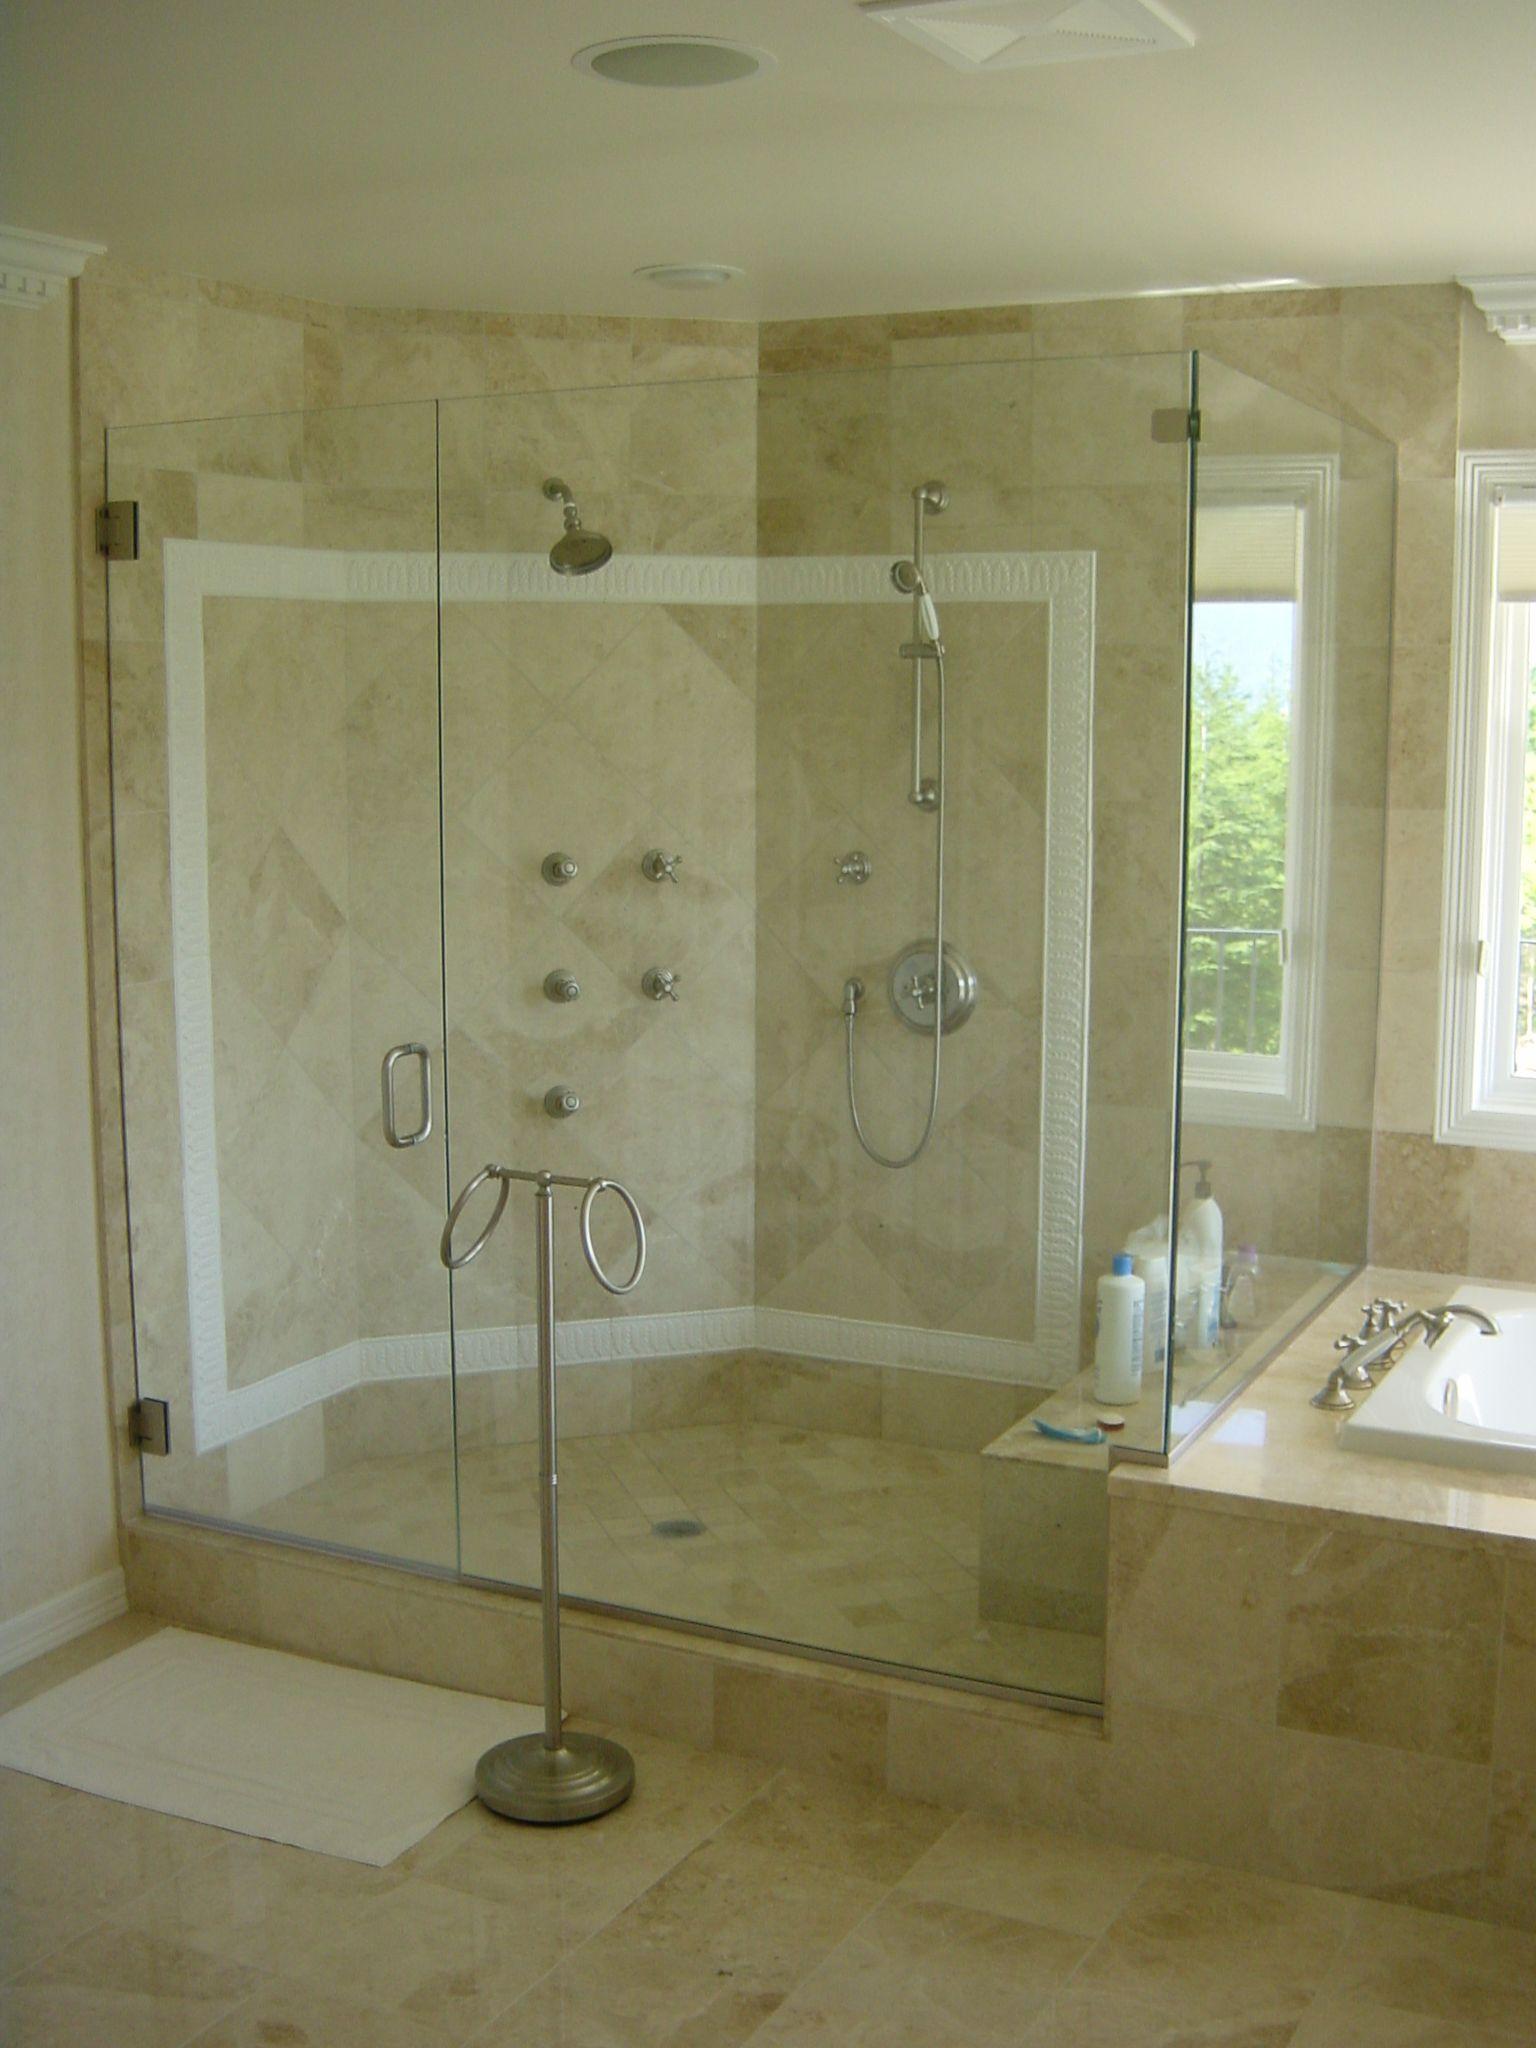 Frameless Glass Hinged Corner Shower Door & Shower Enclosure ...